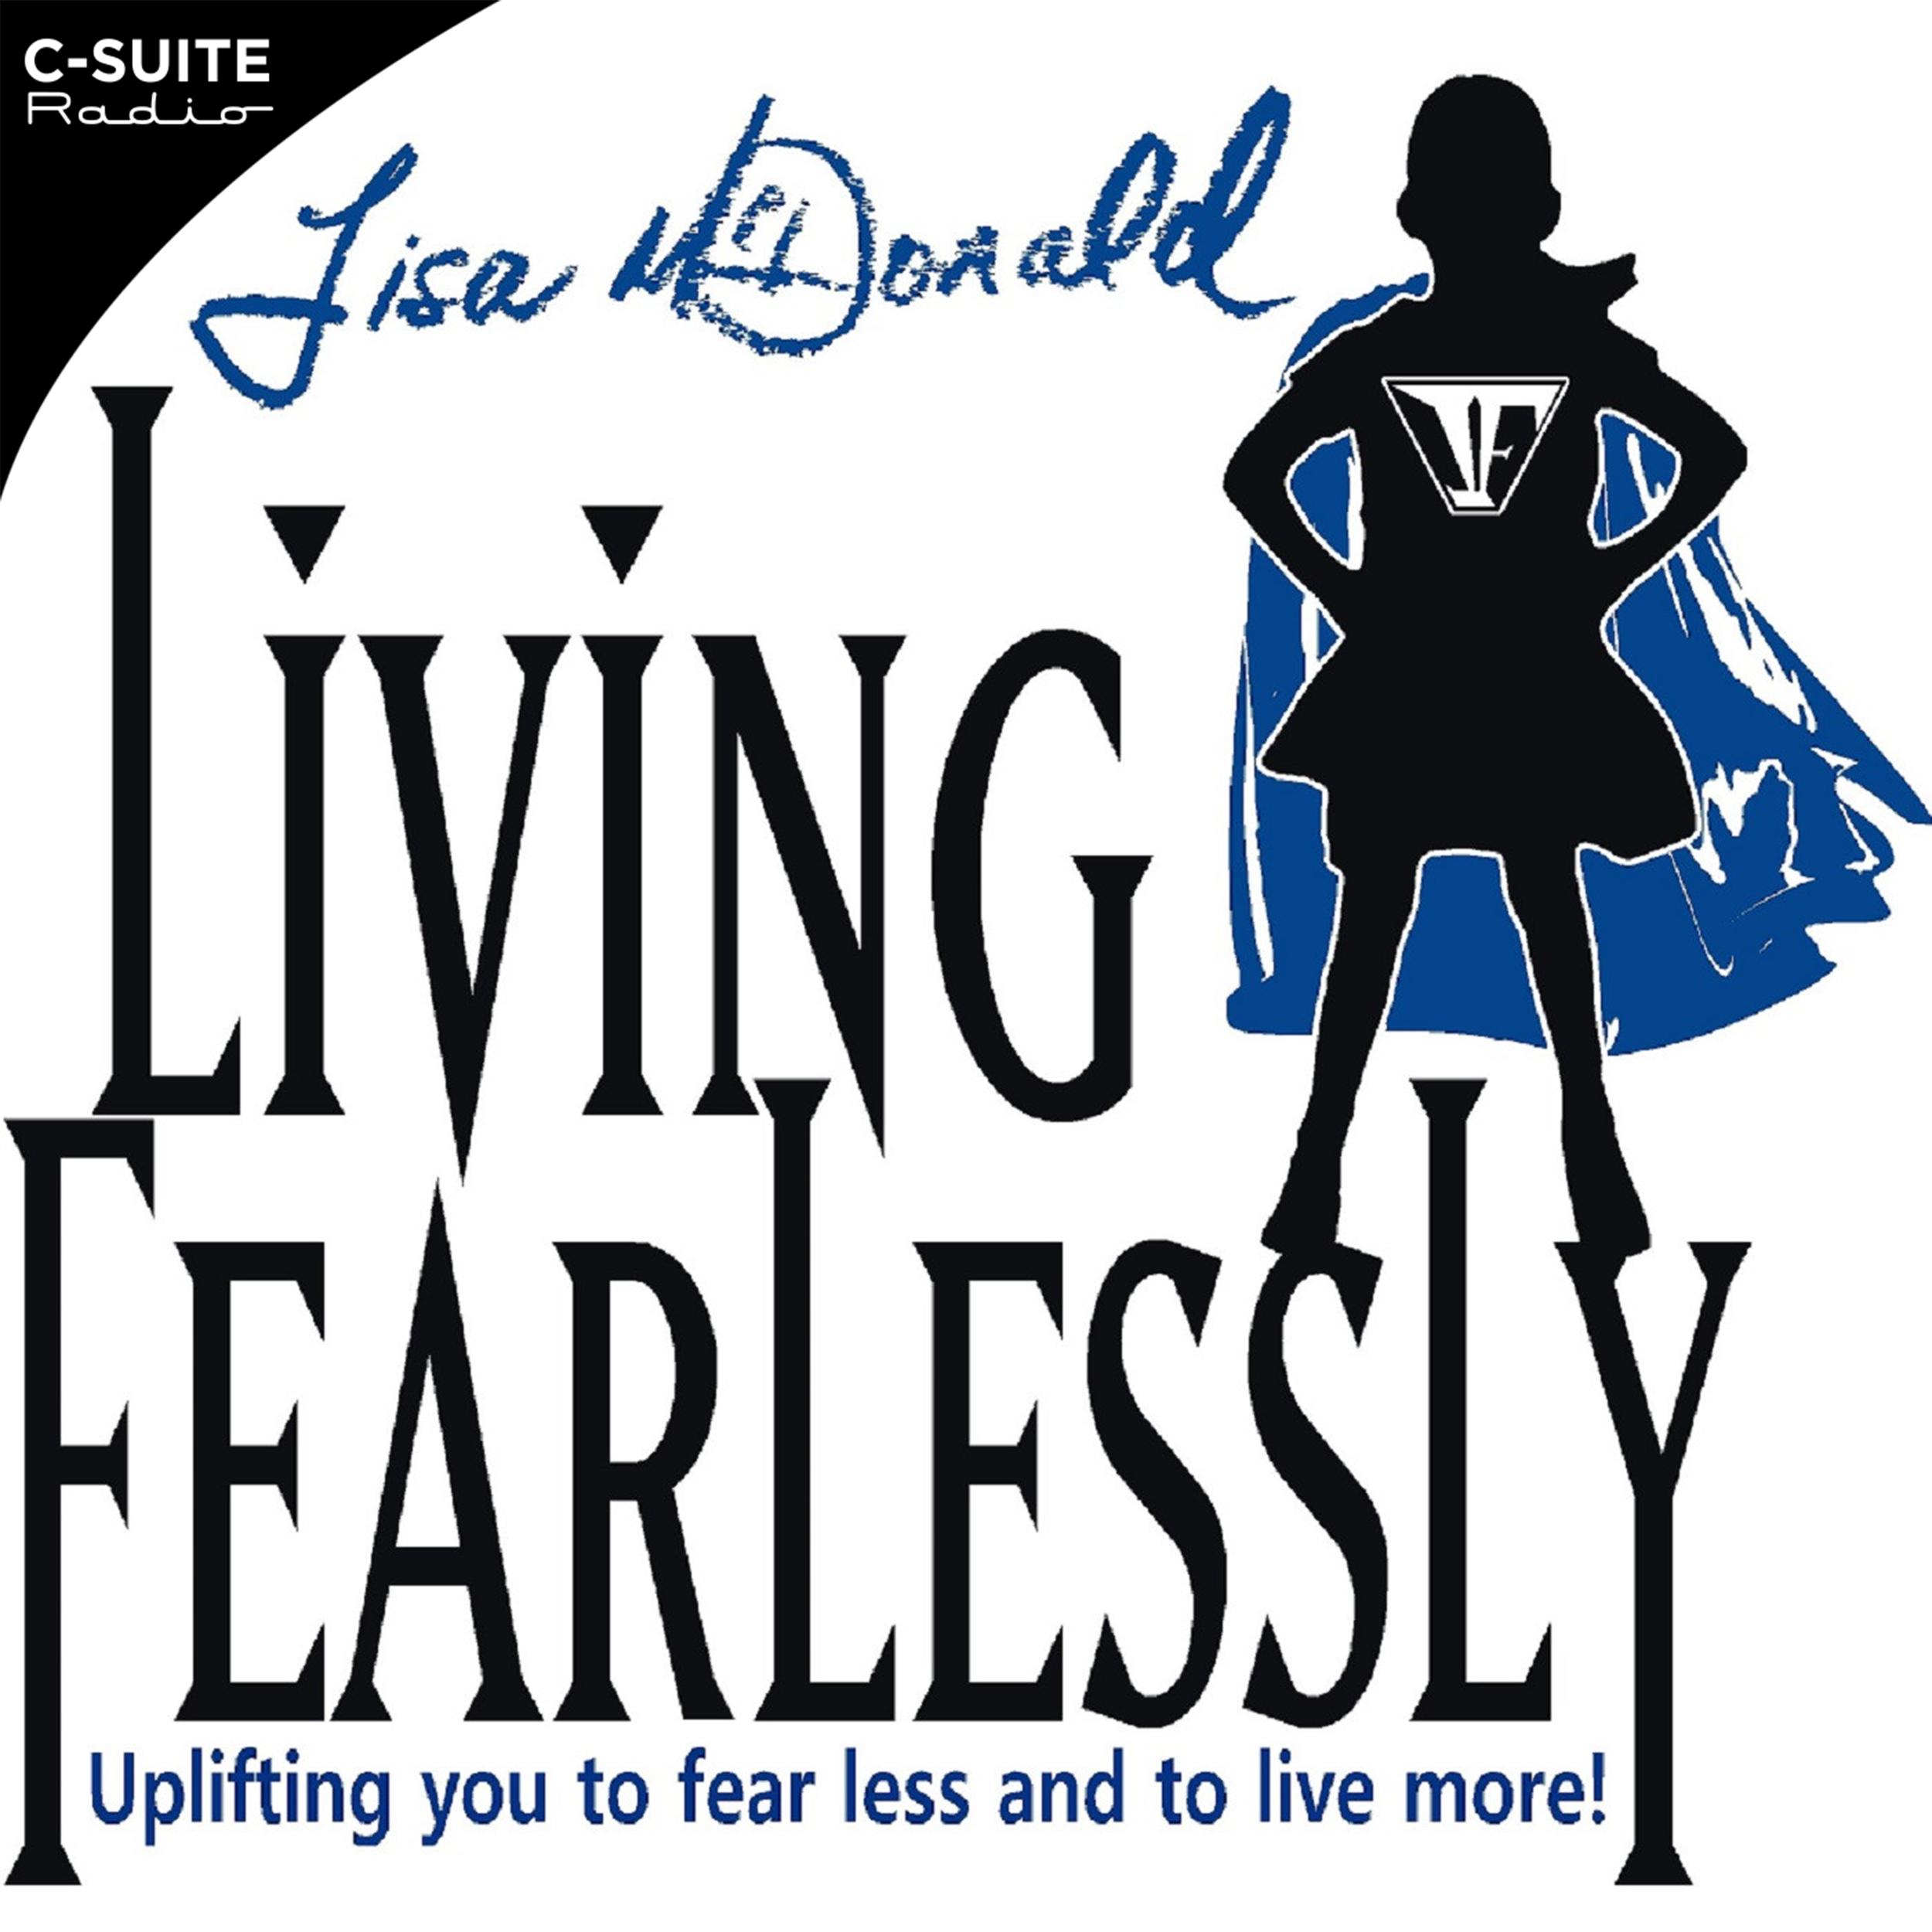 St vincent s fort wayne athletics clipart svg Living Fearlessly with Lisa McDonald - C-Suite Radio svg